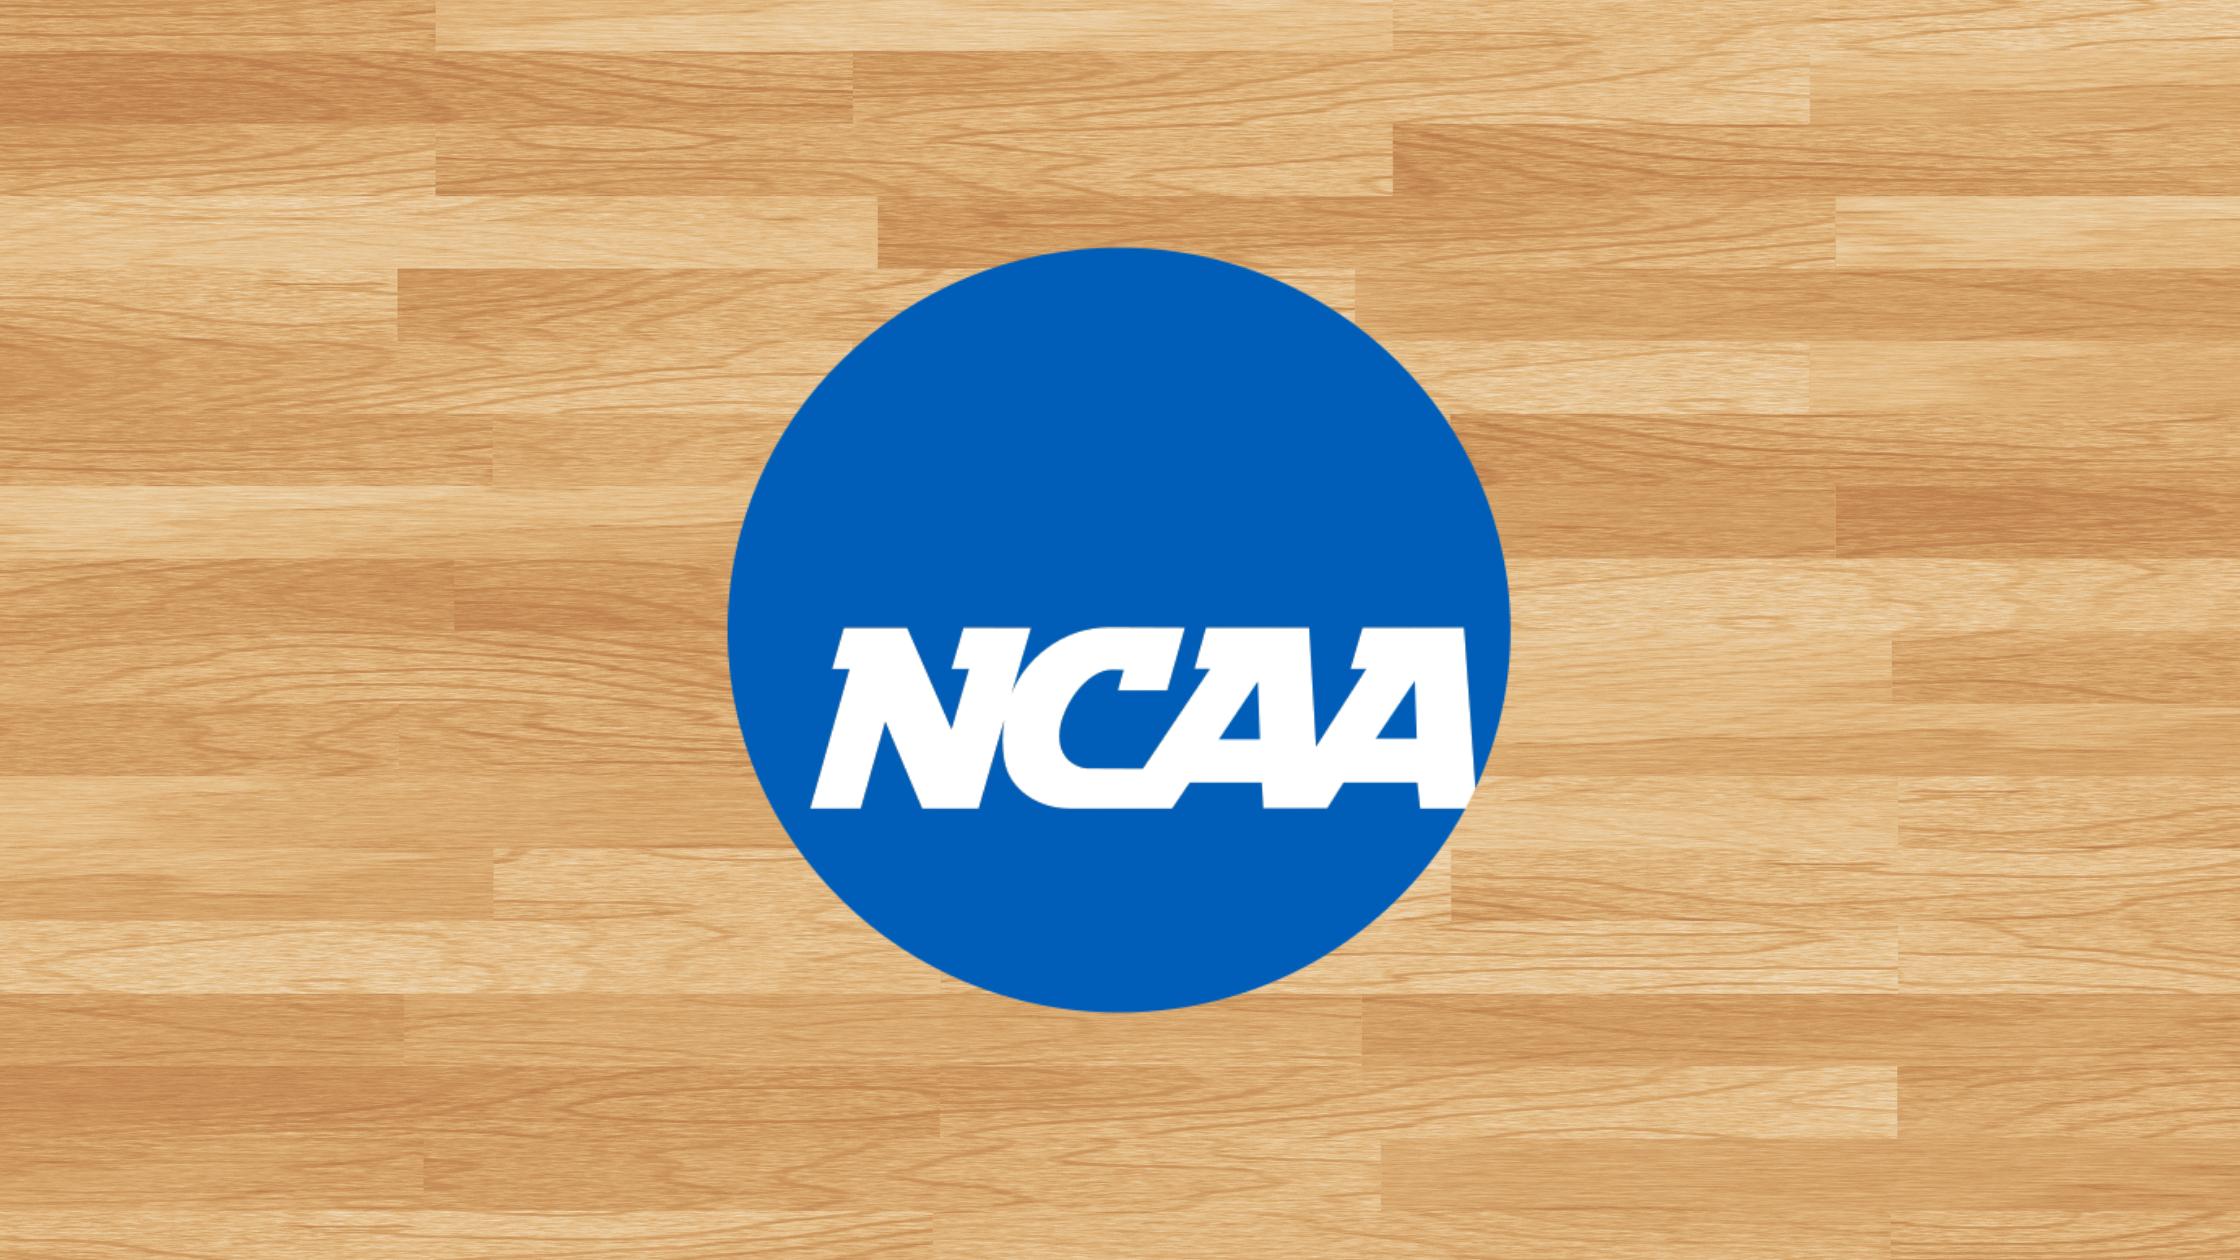 NCAA logo on a basketball court